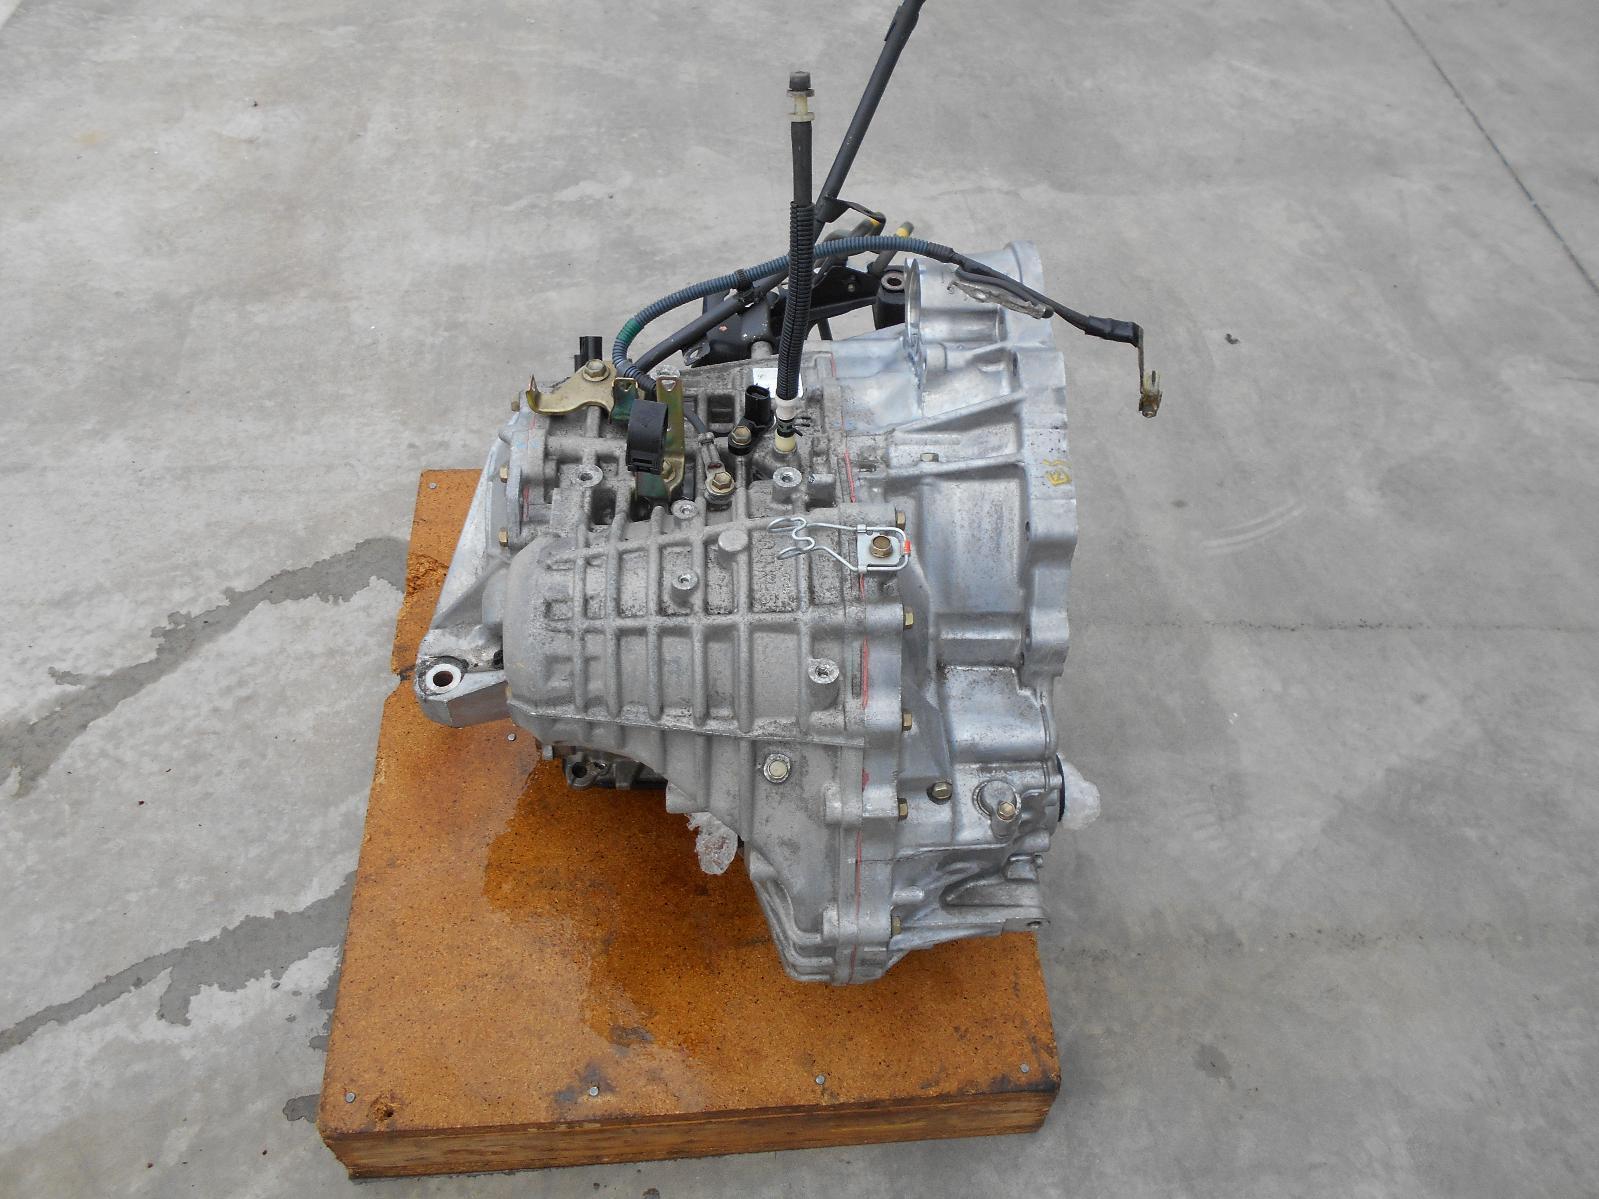 LEXUS ES300, Trans/Gearbox, AUTO, 3.0, 1MZ, MCV30, 10/01-12/05